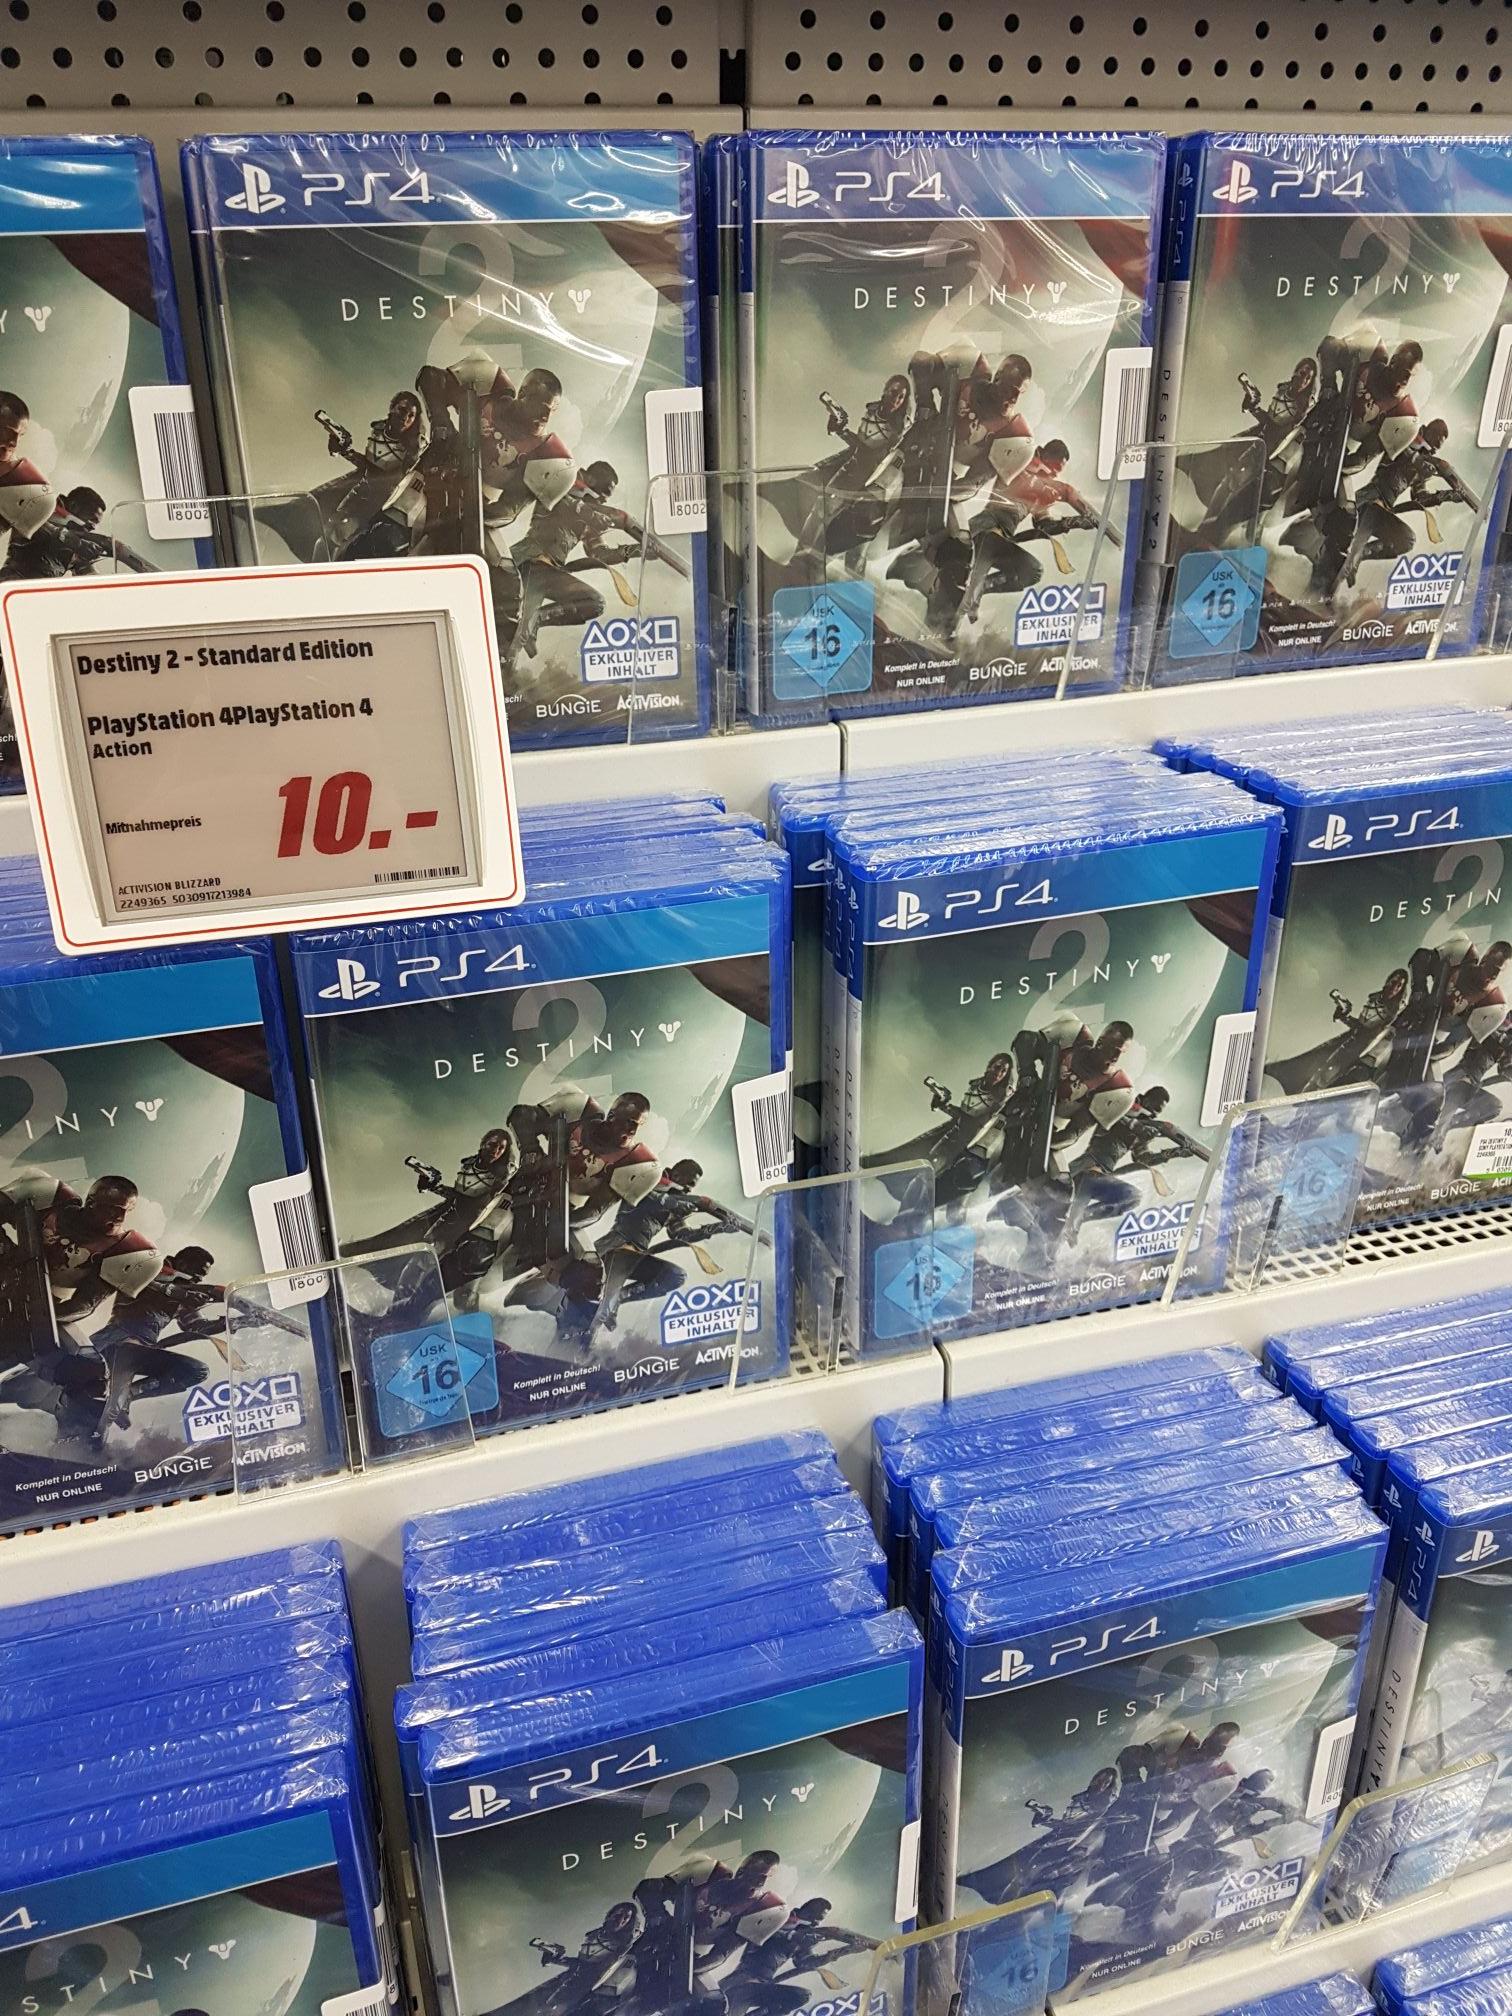 [Lokal?] Destiny 2 PS4 Standartedition Dortmund Kley Mediamarkt